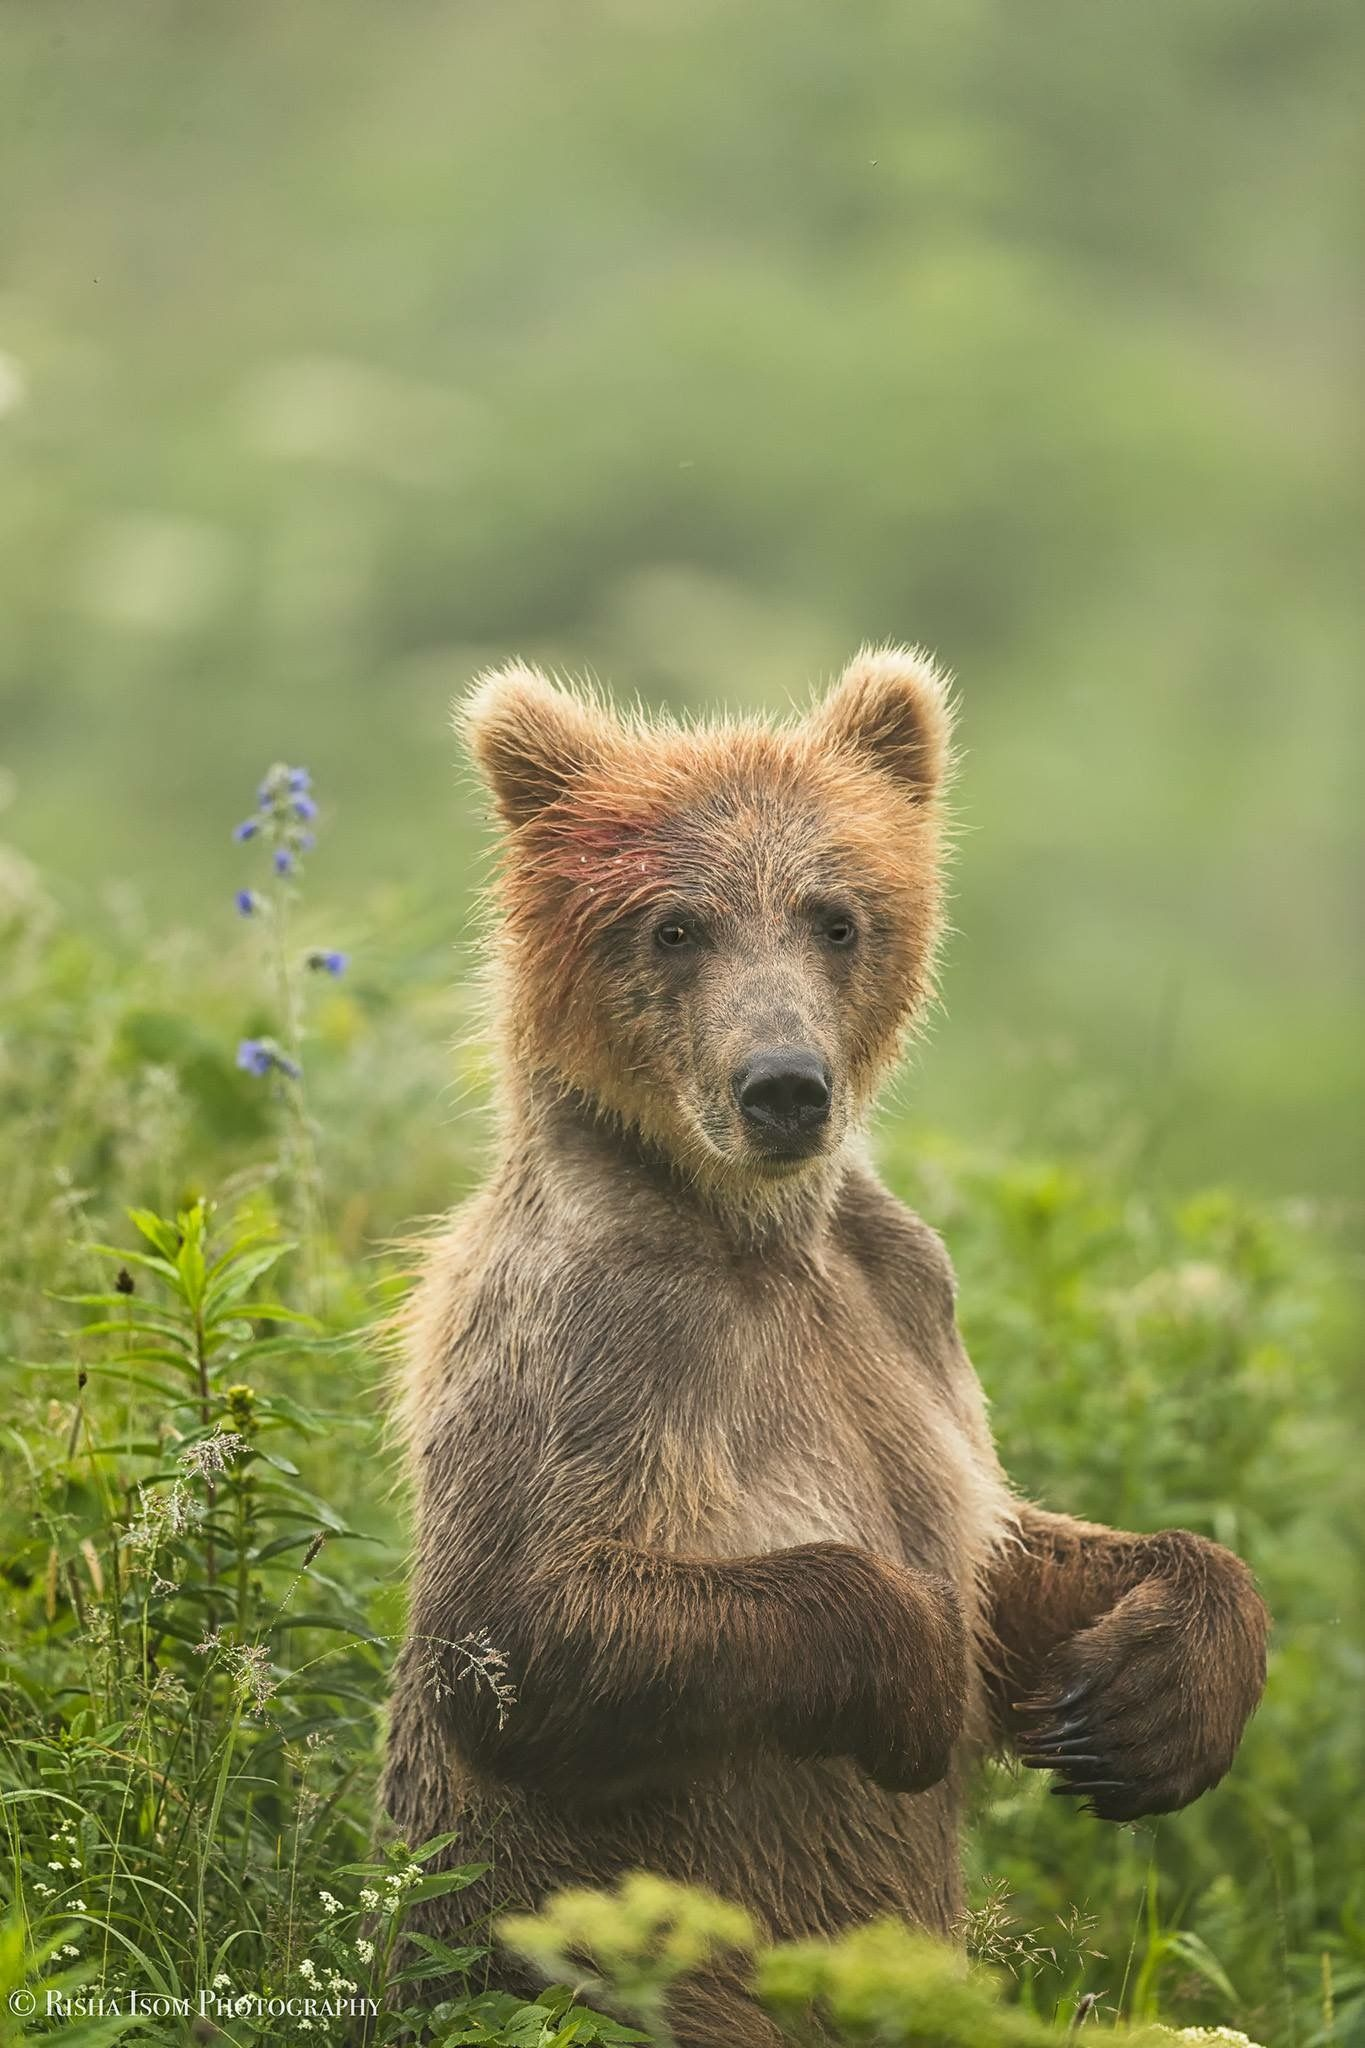 Darling Bear With Images Spirit Animal Bear Baby Animals